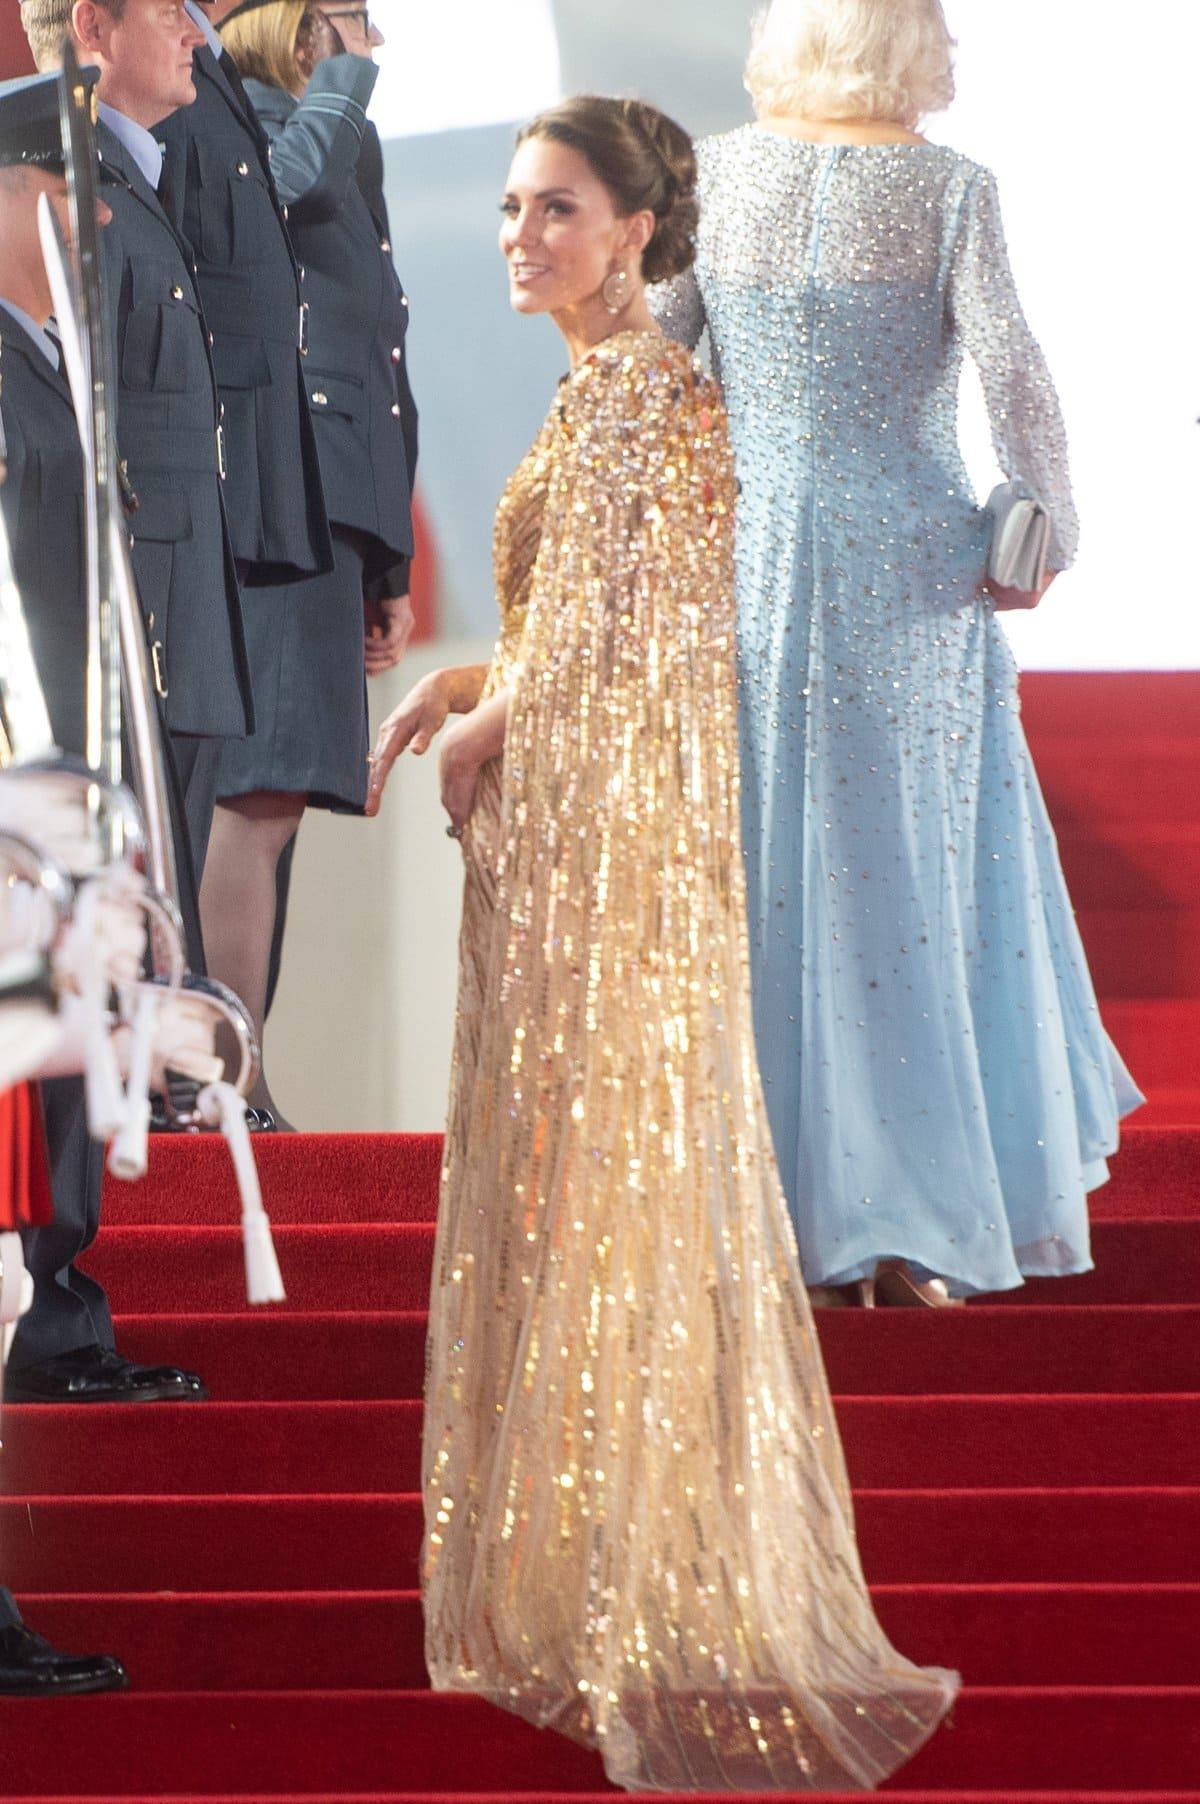 Catherine, Duchess of Cambridge is often seen in dresses by British fashion designer Jenny Packham